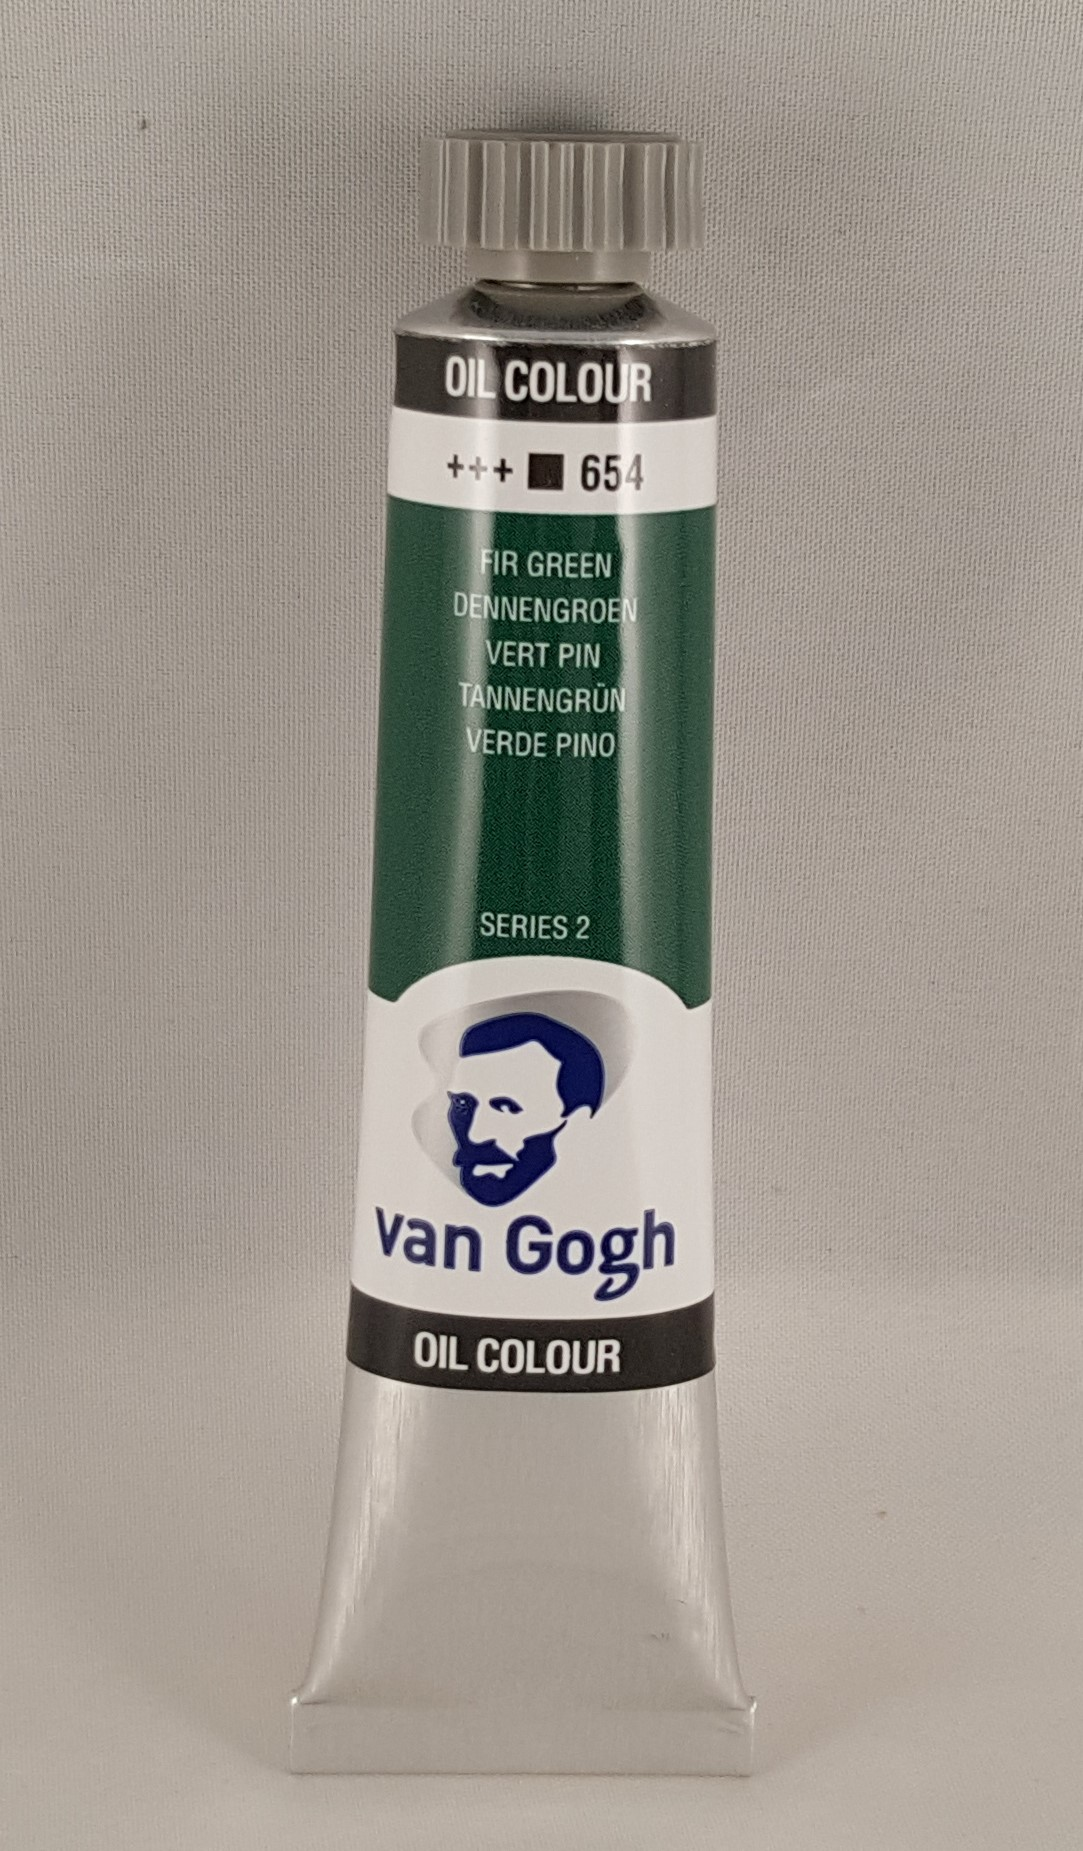 Tinta de óleo Van Gogh fir green